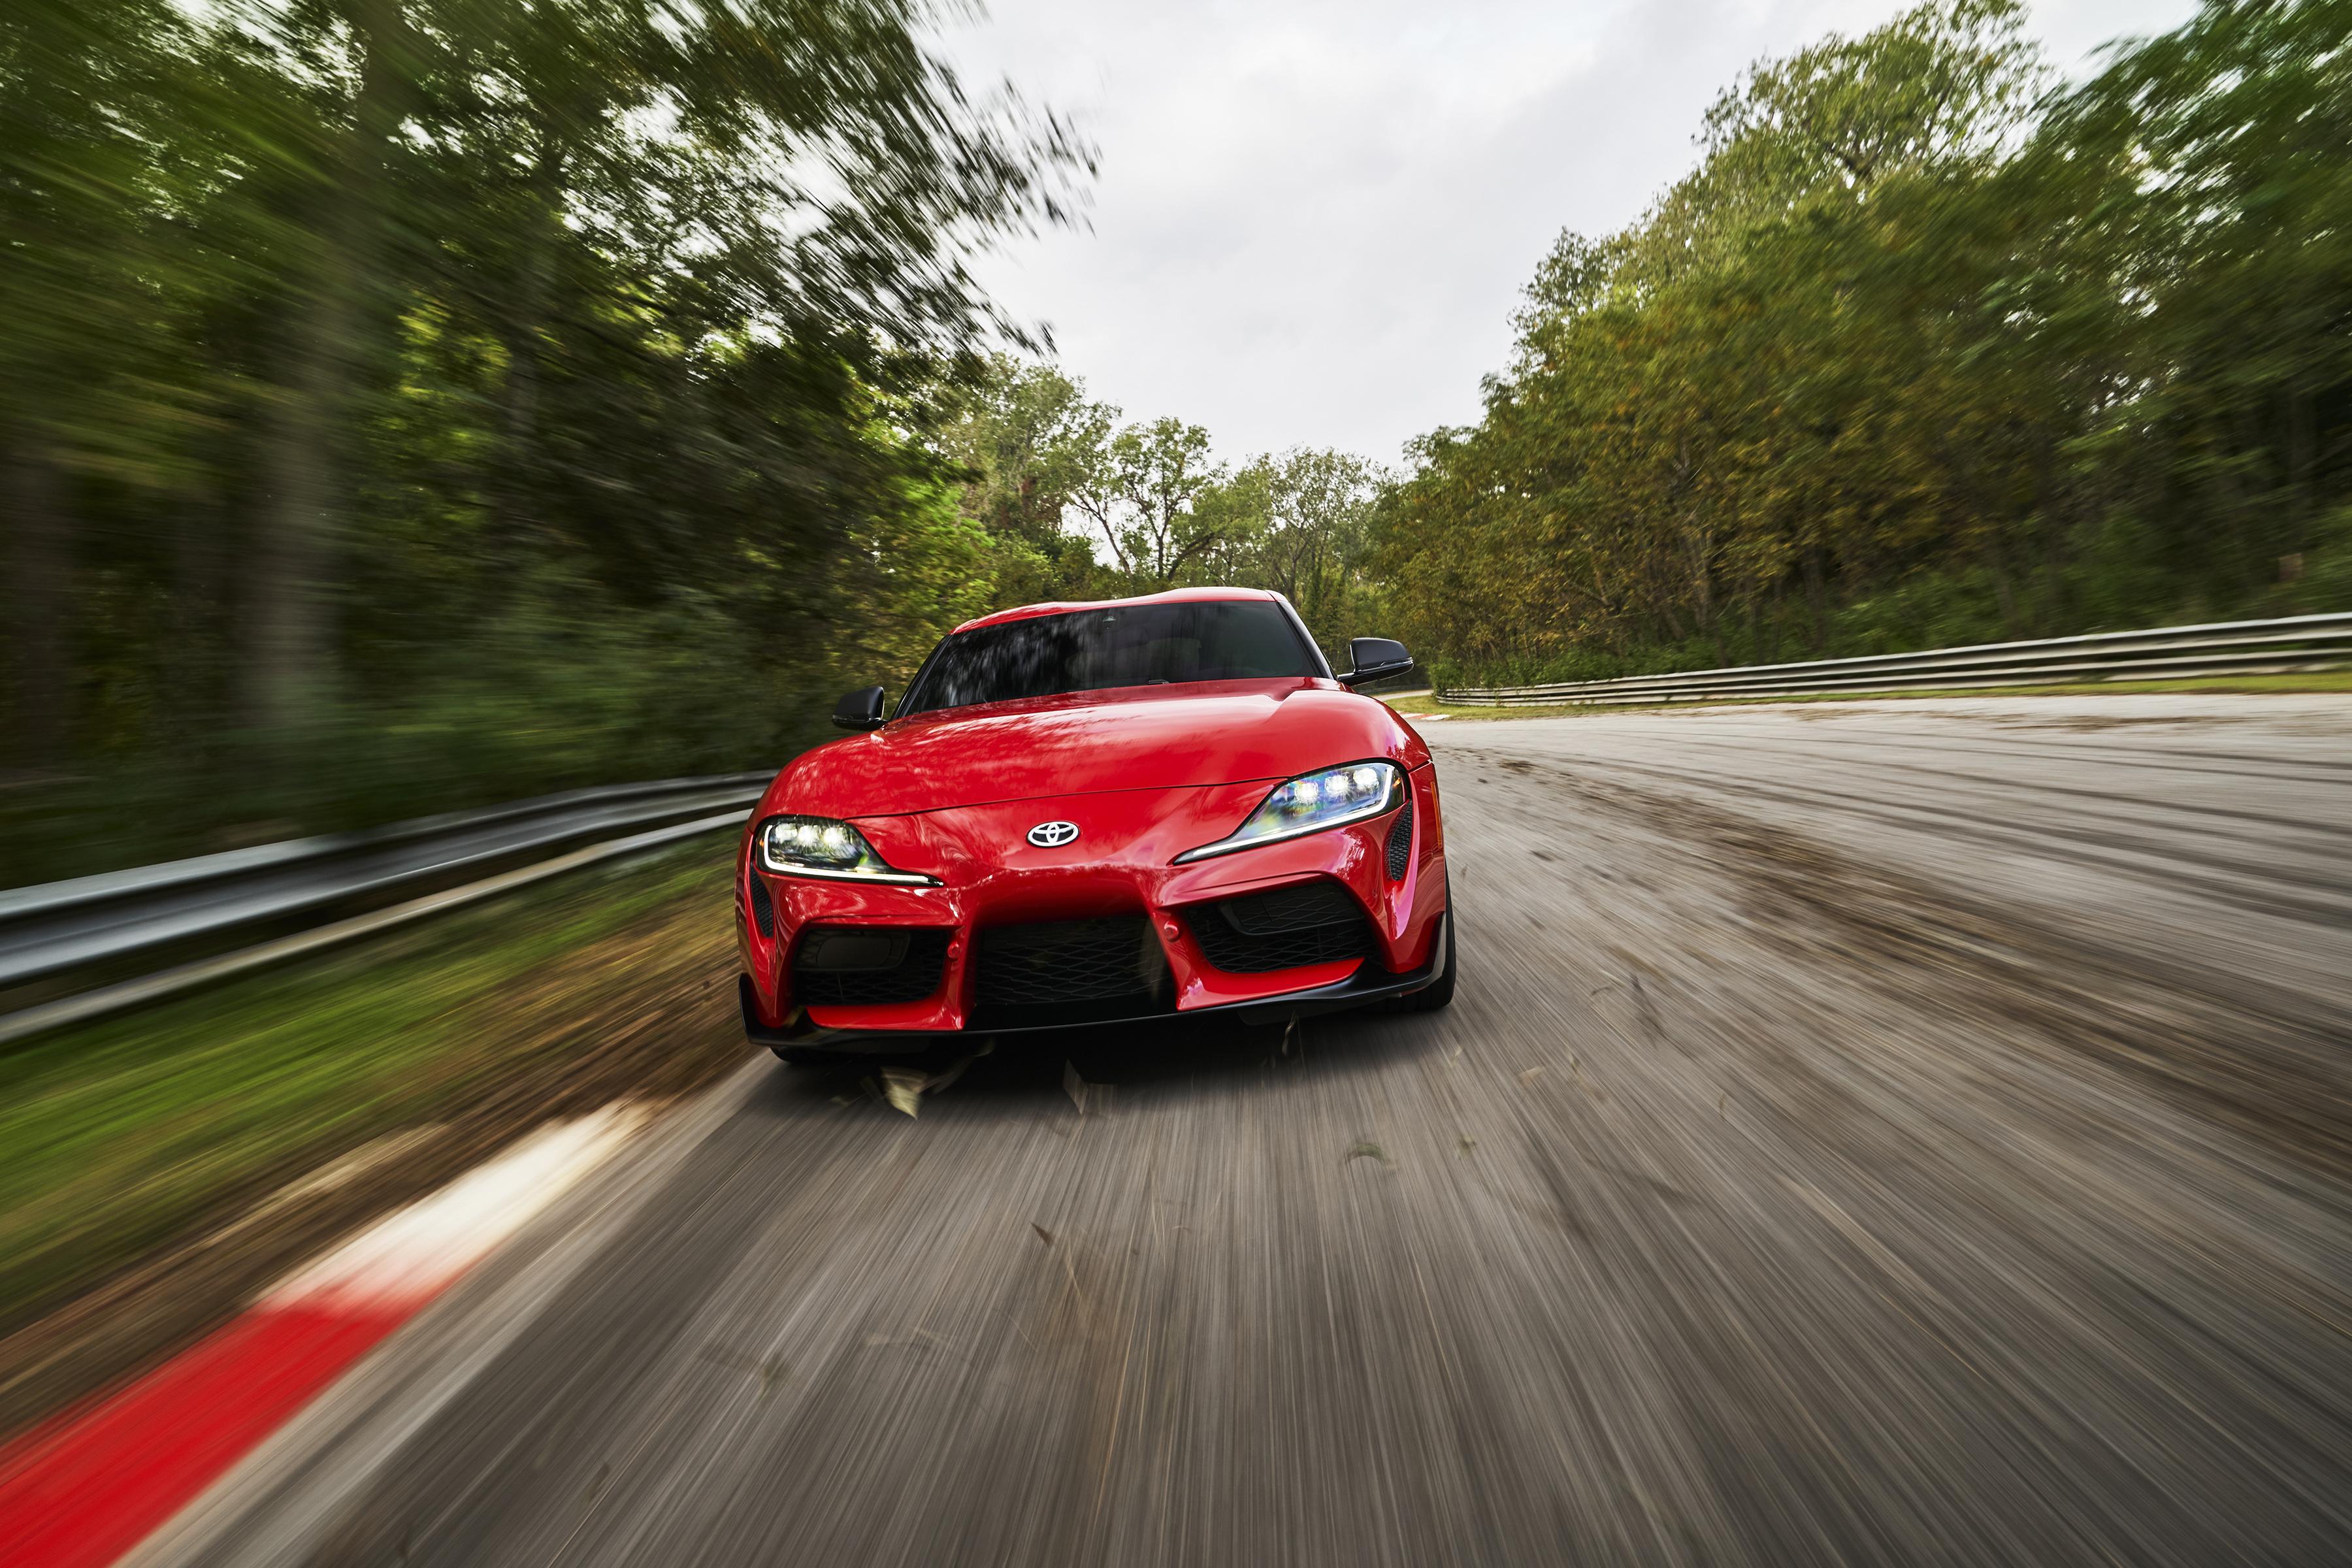 Toyota GR Supra pricing